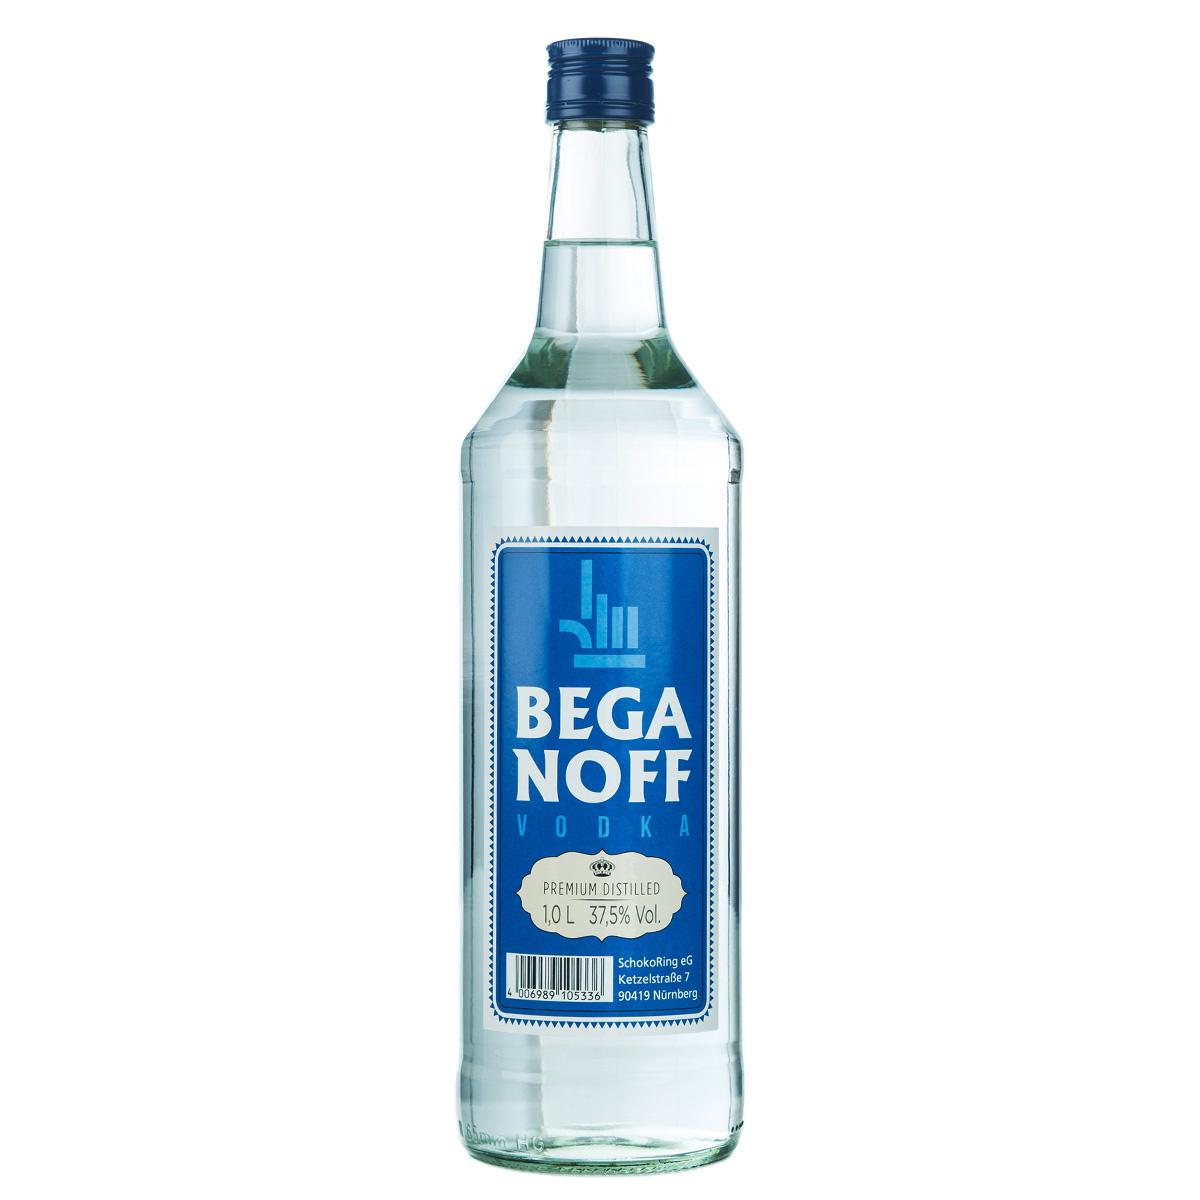 Beganoff Vodka